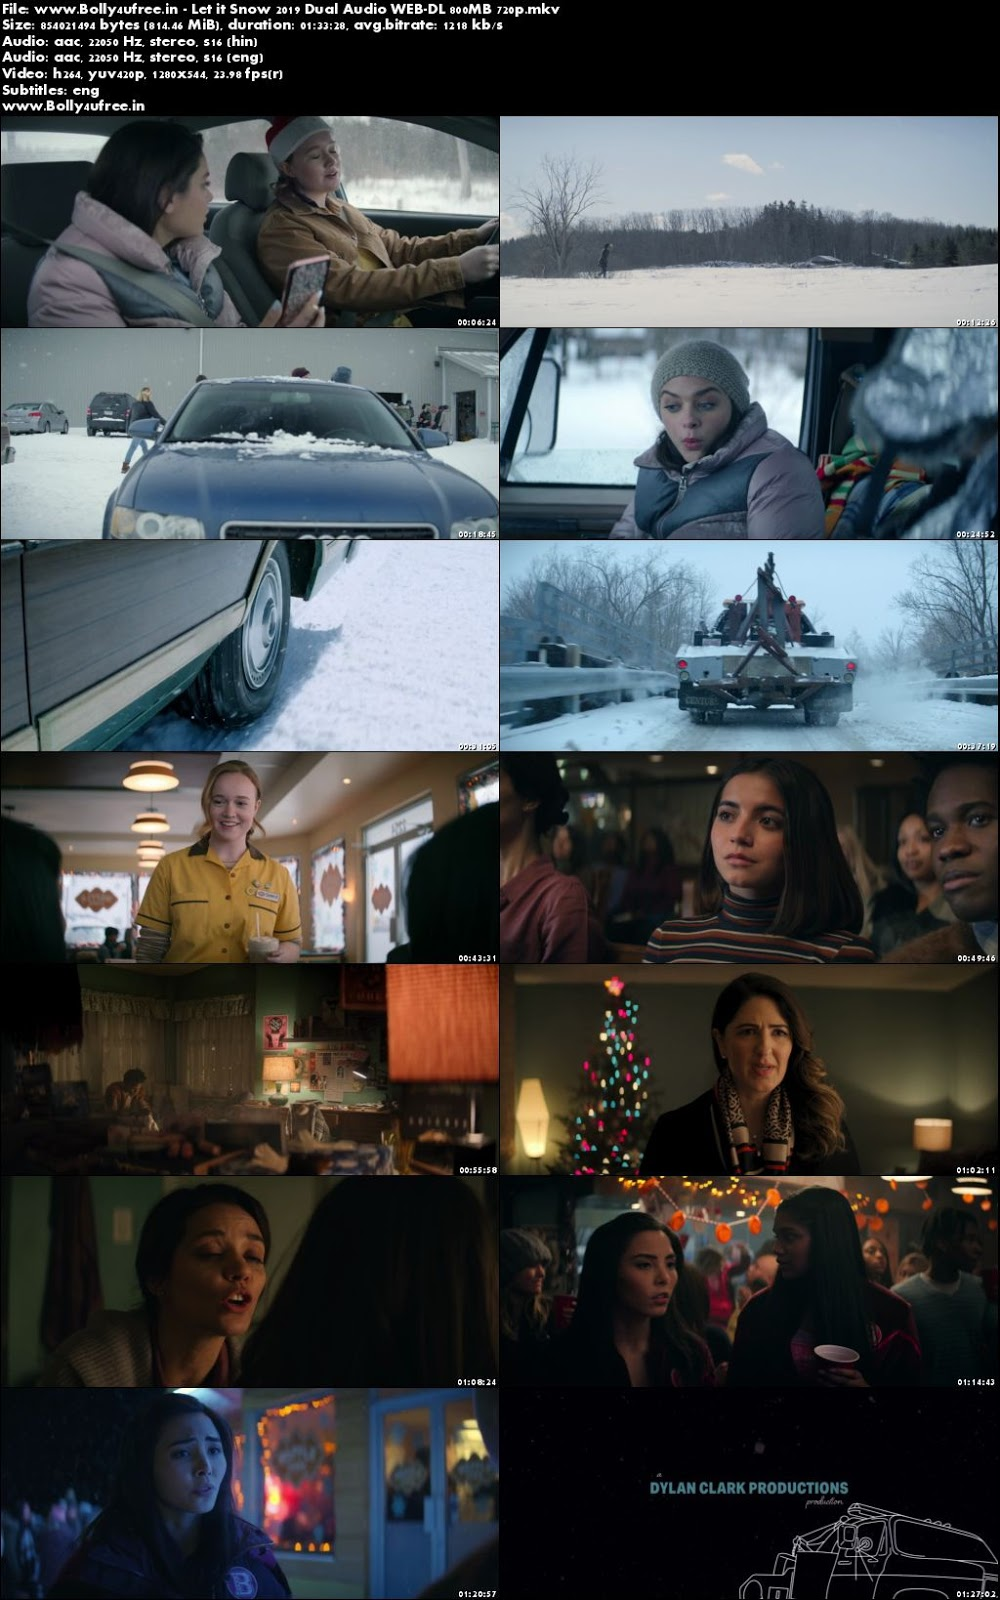 Let it Snow 2019 Hindi Dual Audio WEB-DL 800MB 720p